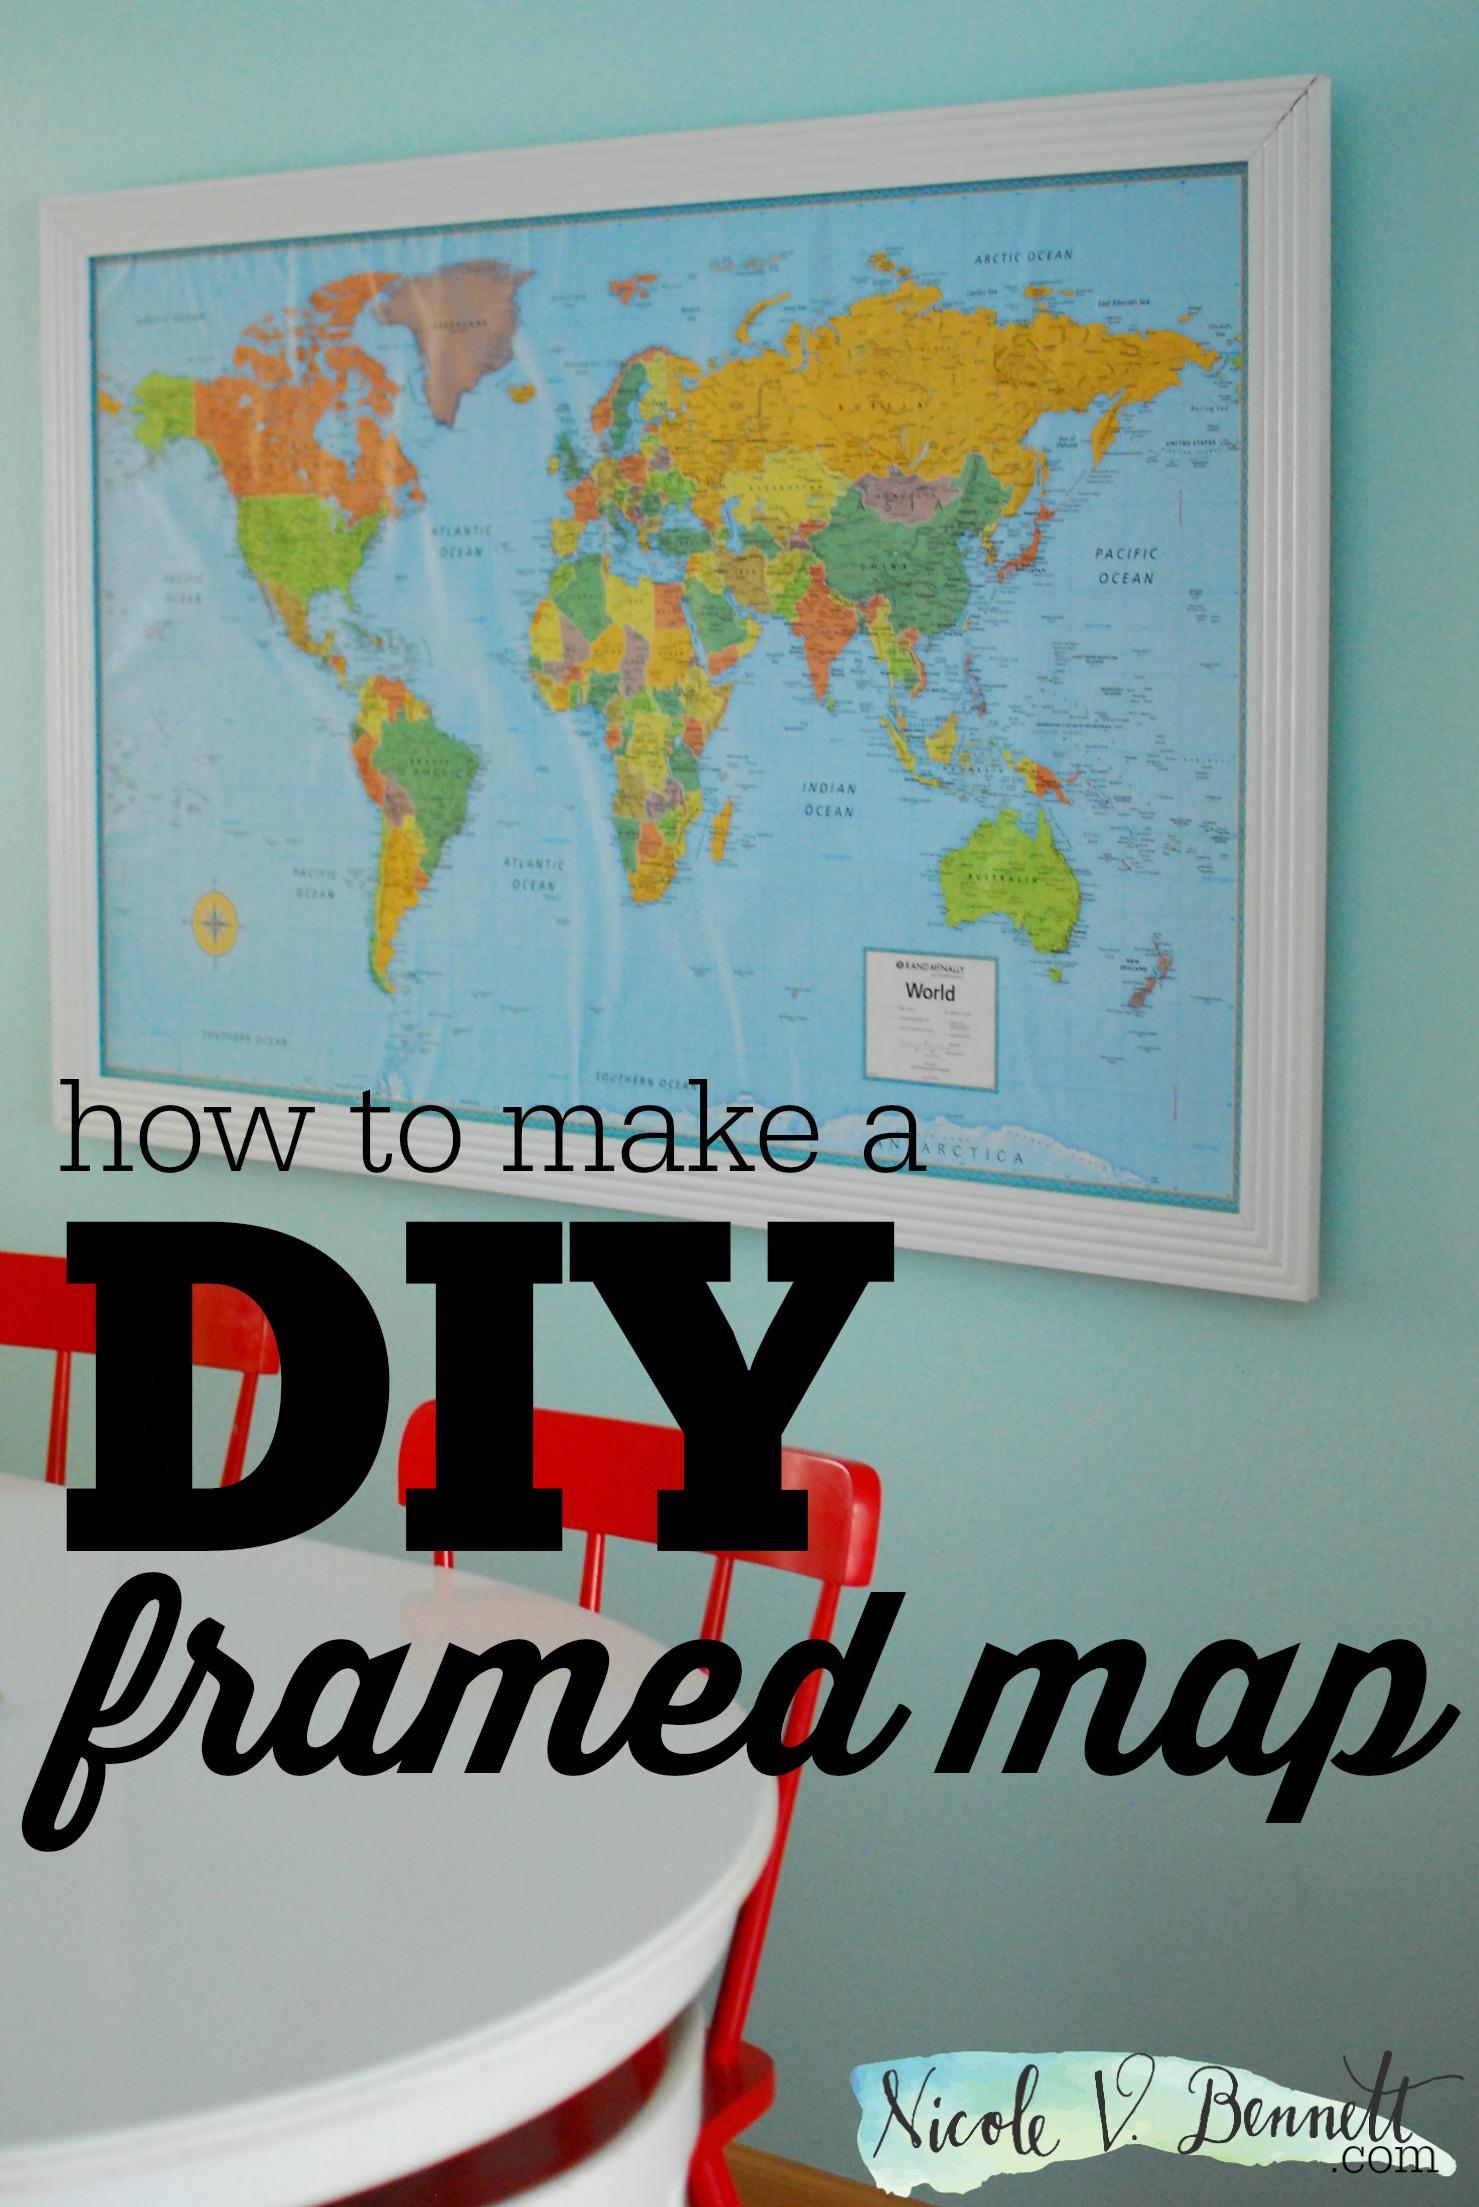 how to make a DIY framed map